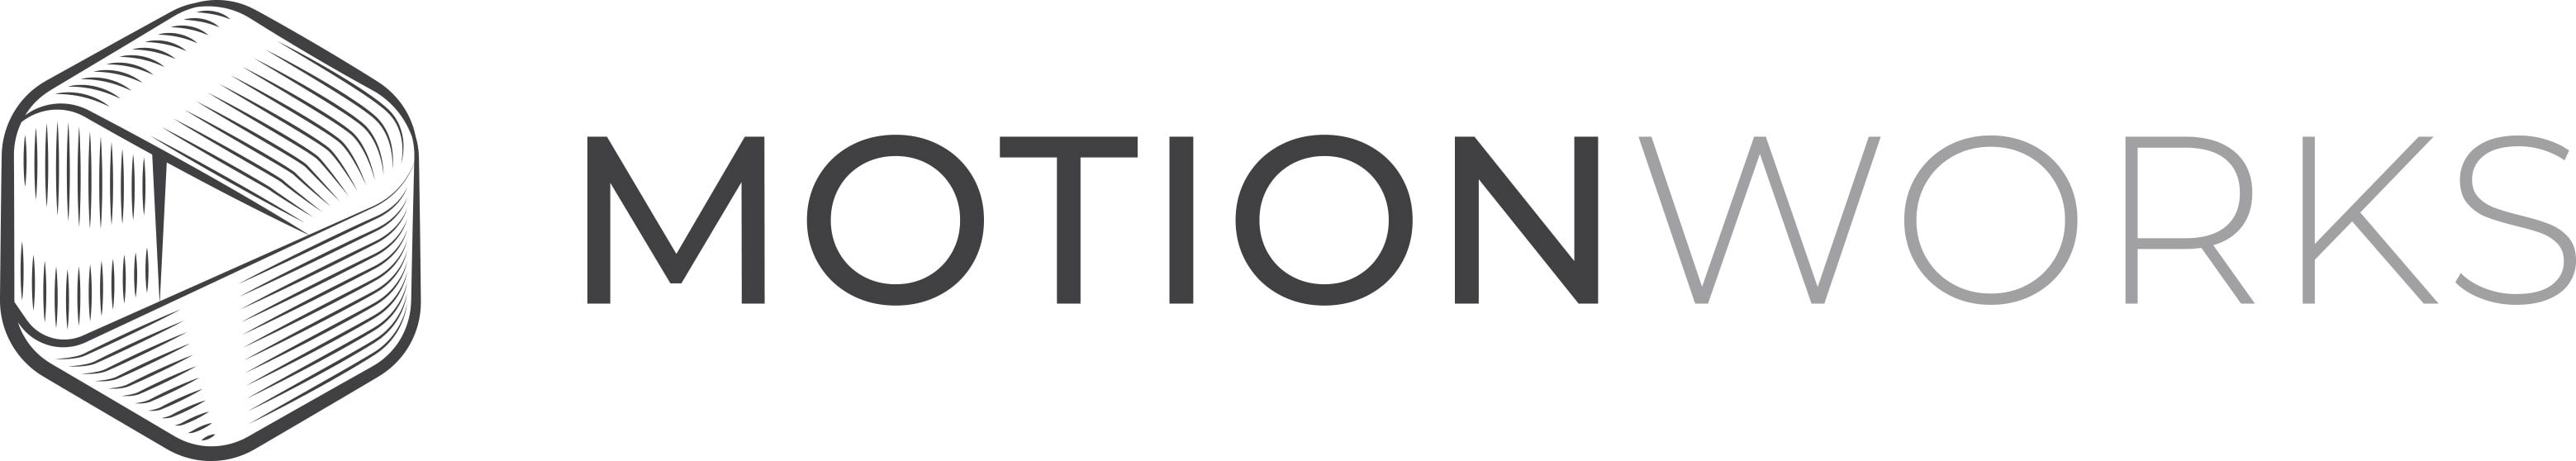 WV MotionWorks